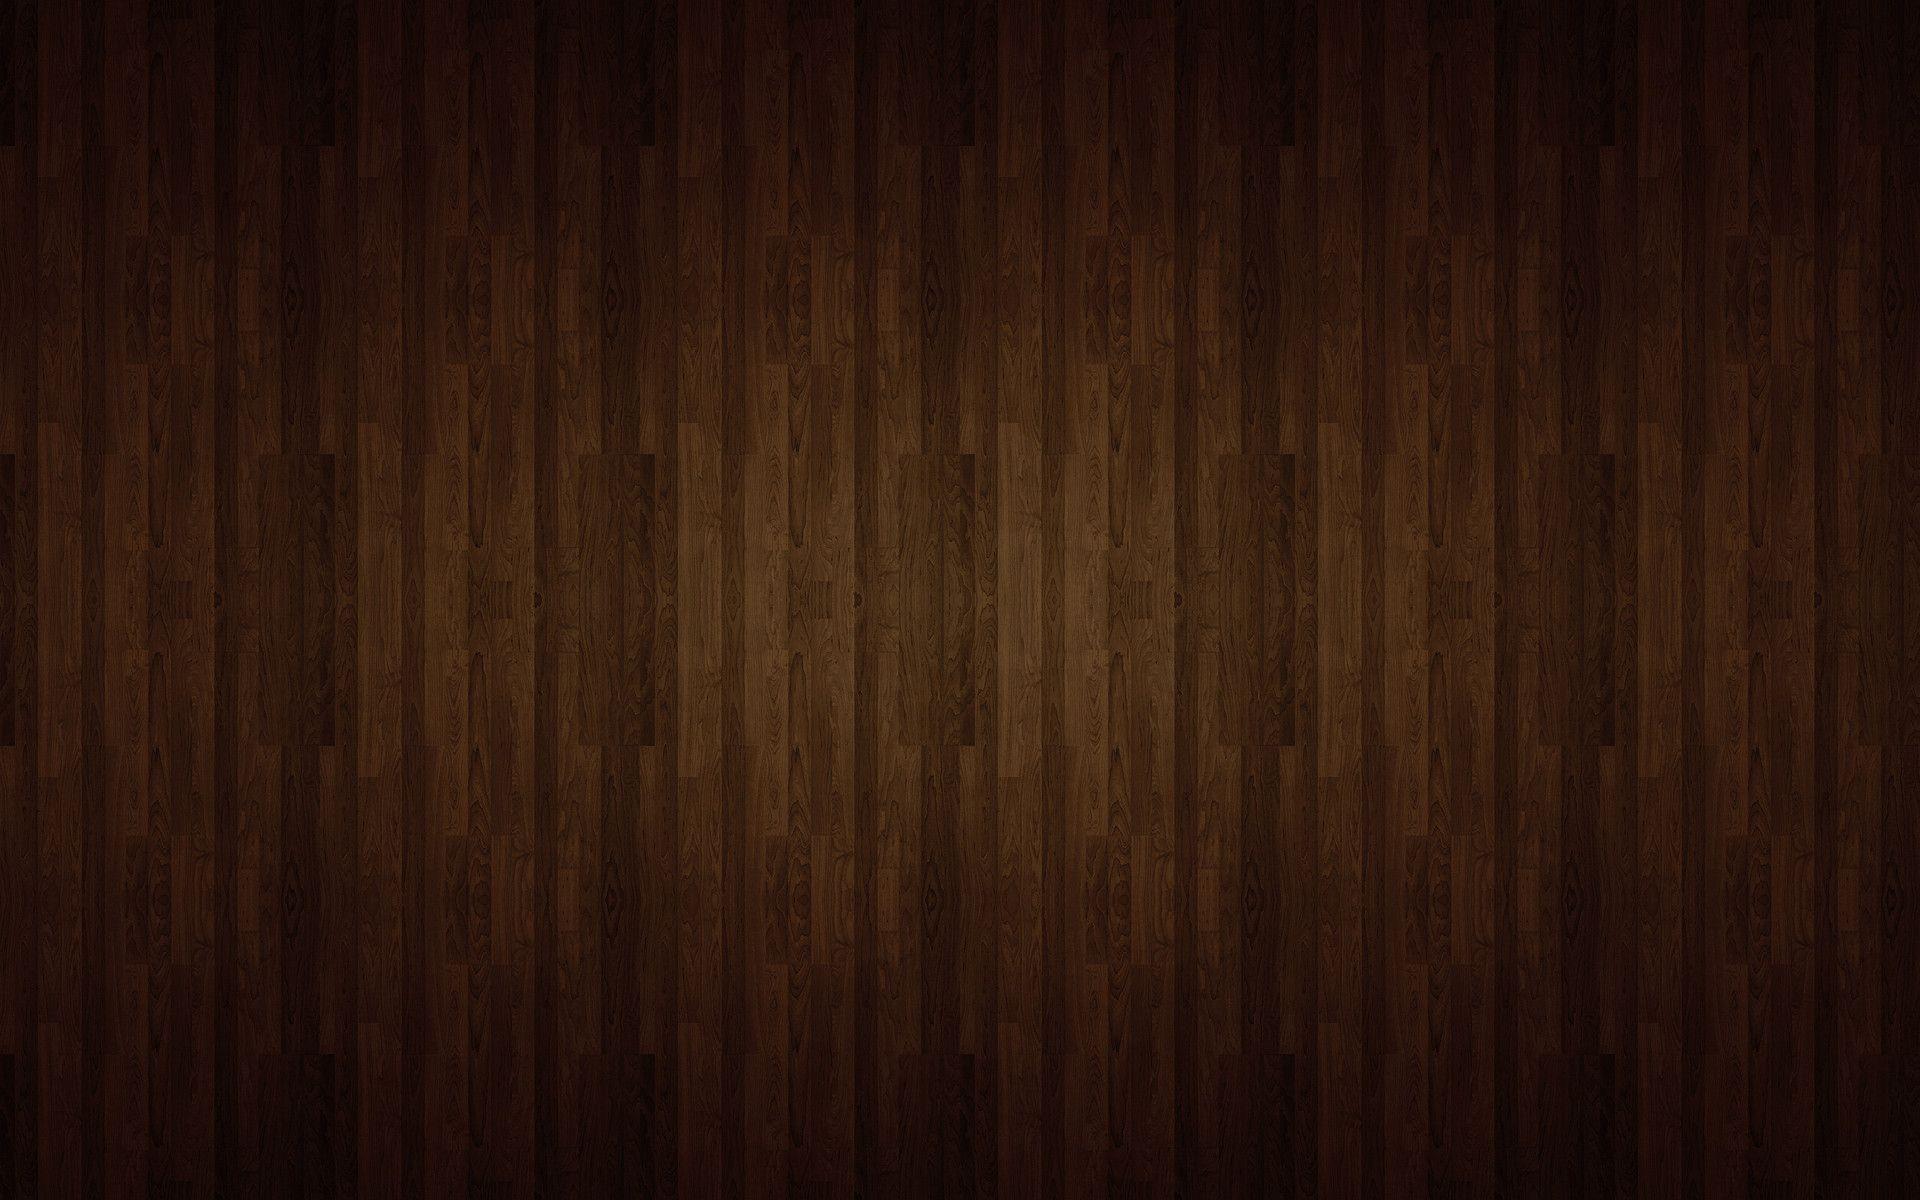 Black Wood HD Wallpaper 1920 1200. Dark Woods Wallpapers  33 Wallpapers    Adorable Wallpapers